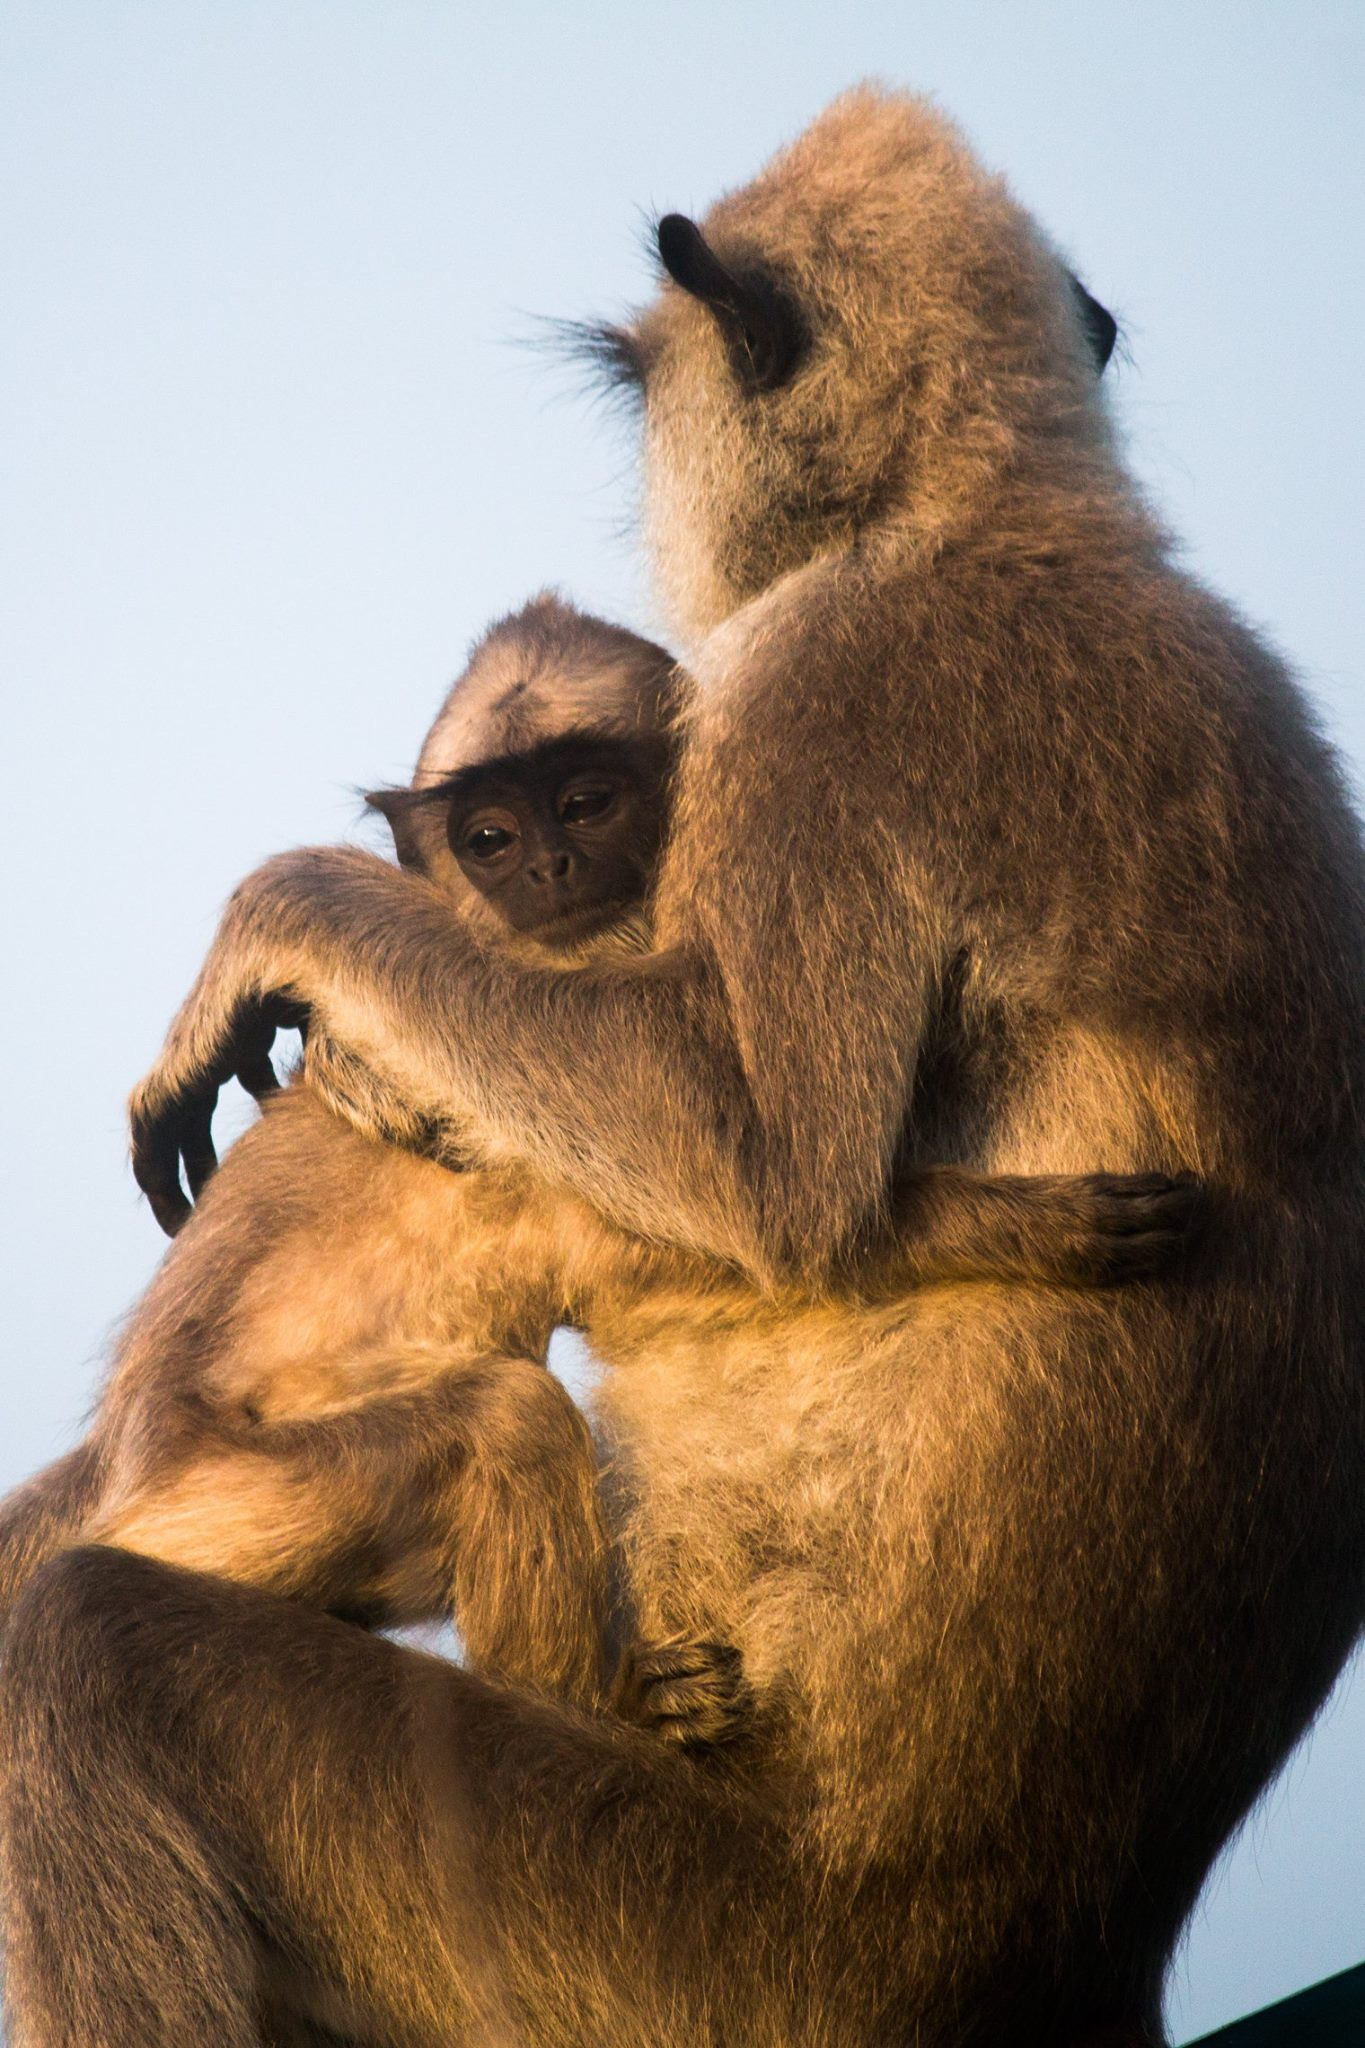 invite-to-paradise-sri-lanka-and-maldives-specialists-travel-agent-tour-operator-customer-review--feedback-joel-rhian-monkey-7.jpg